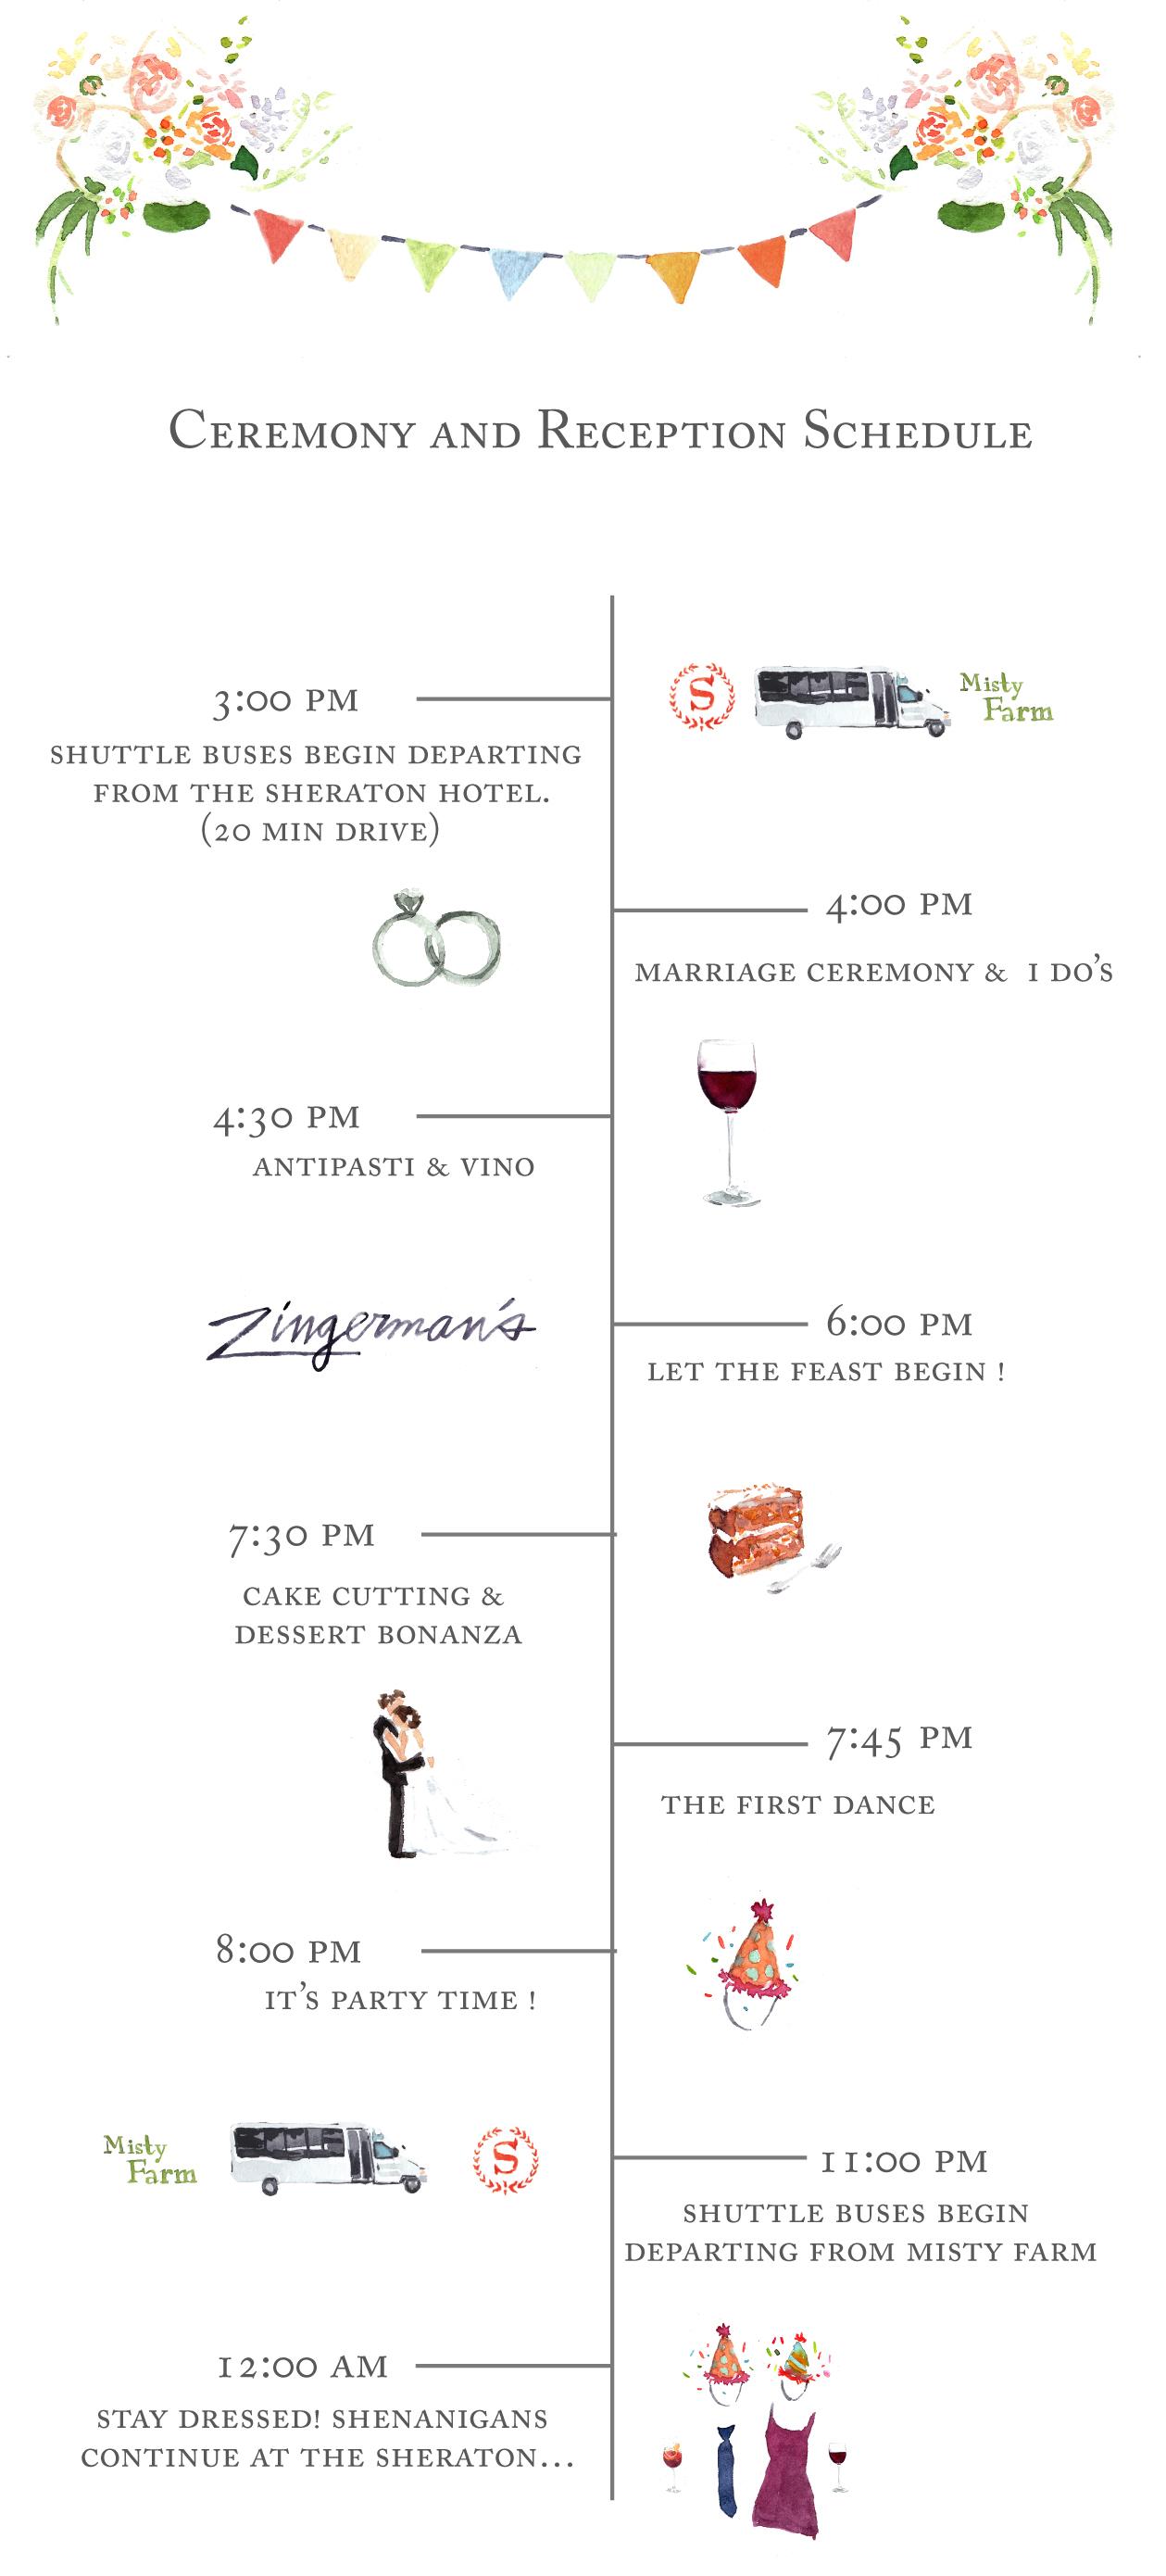 Wedding Schedule front for internet copy.jpg